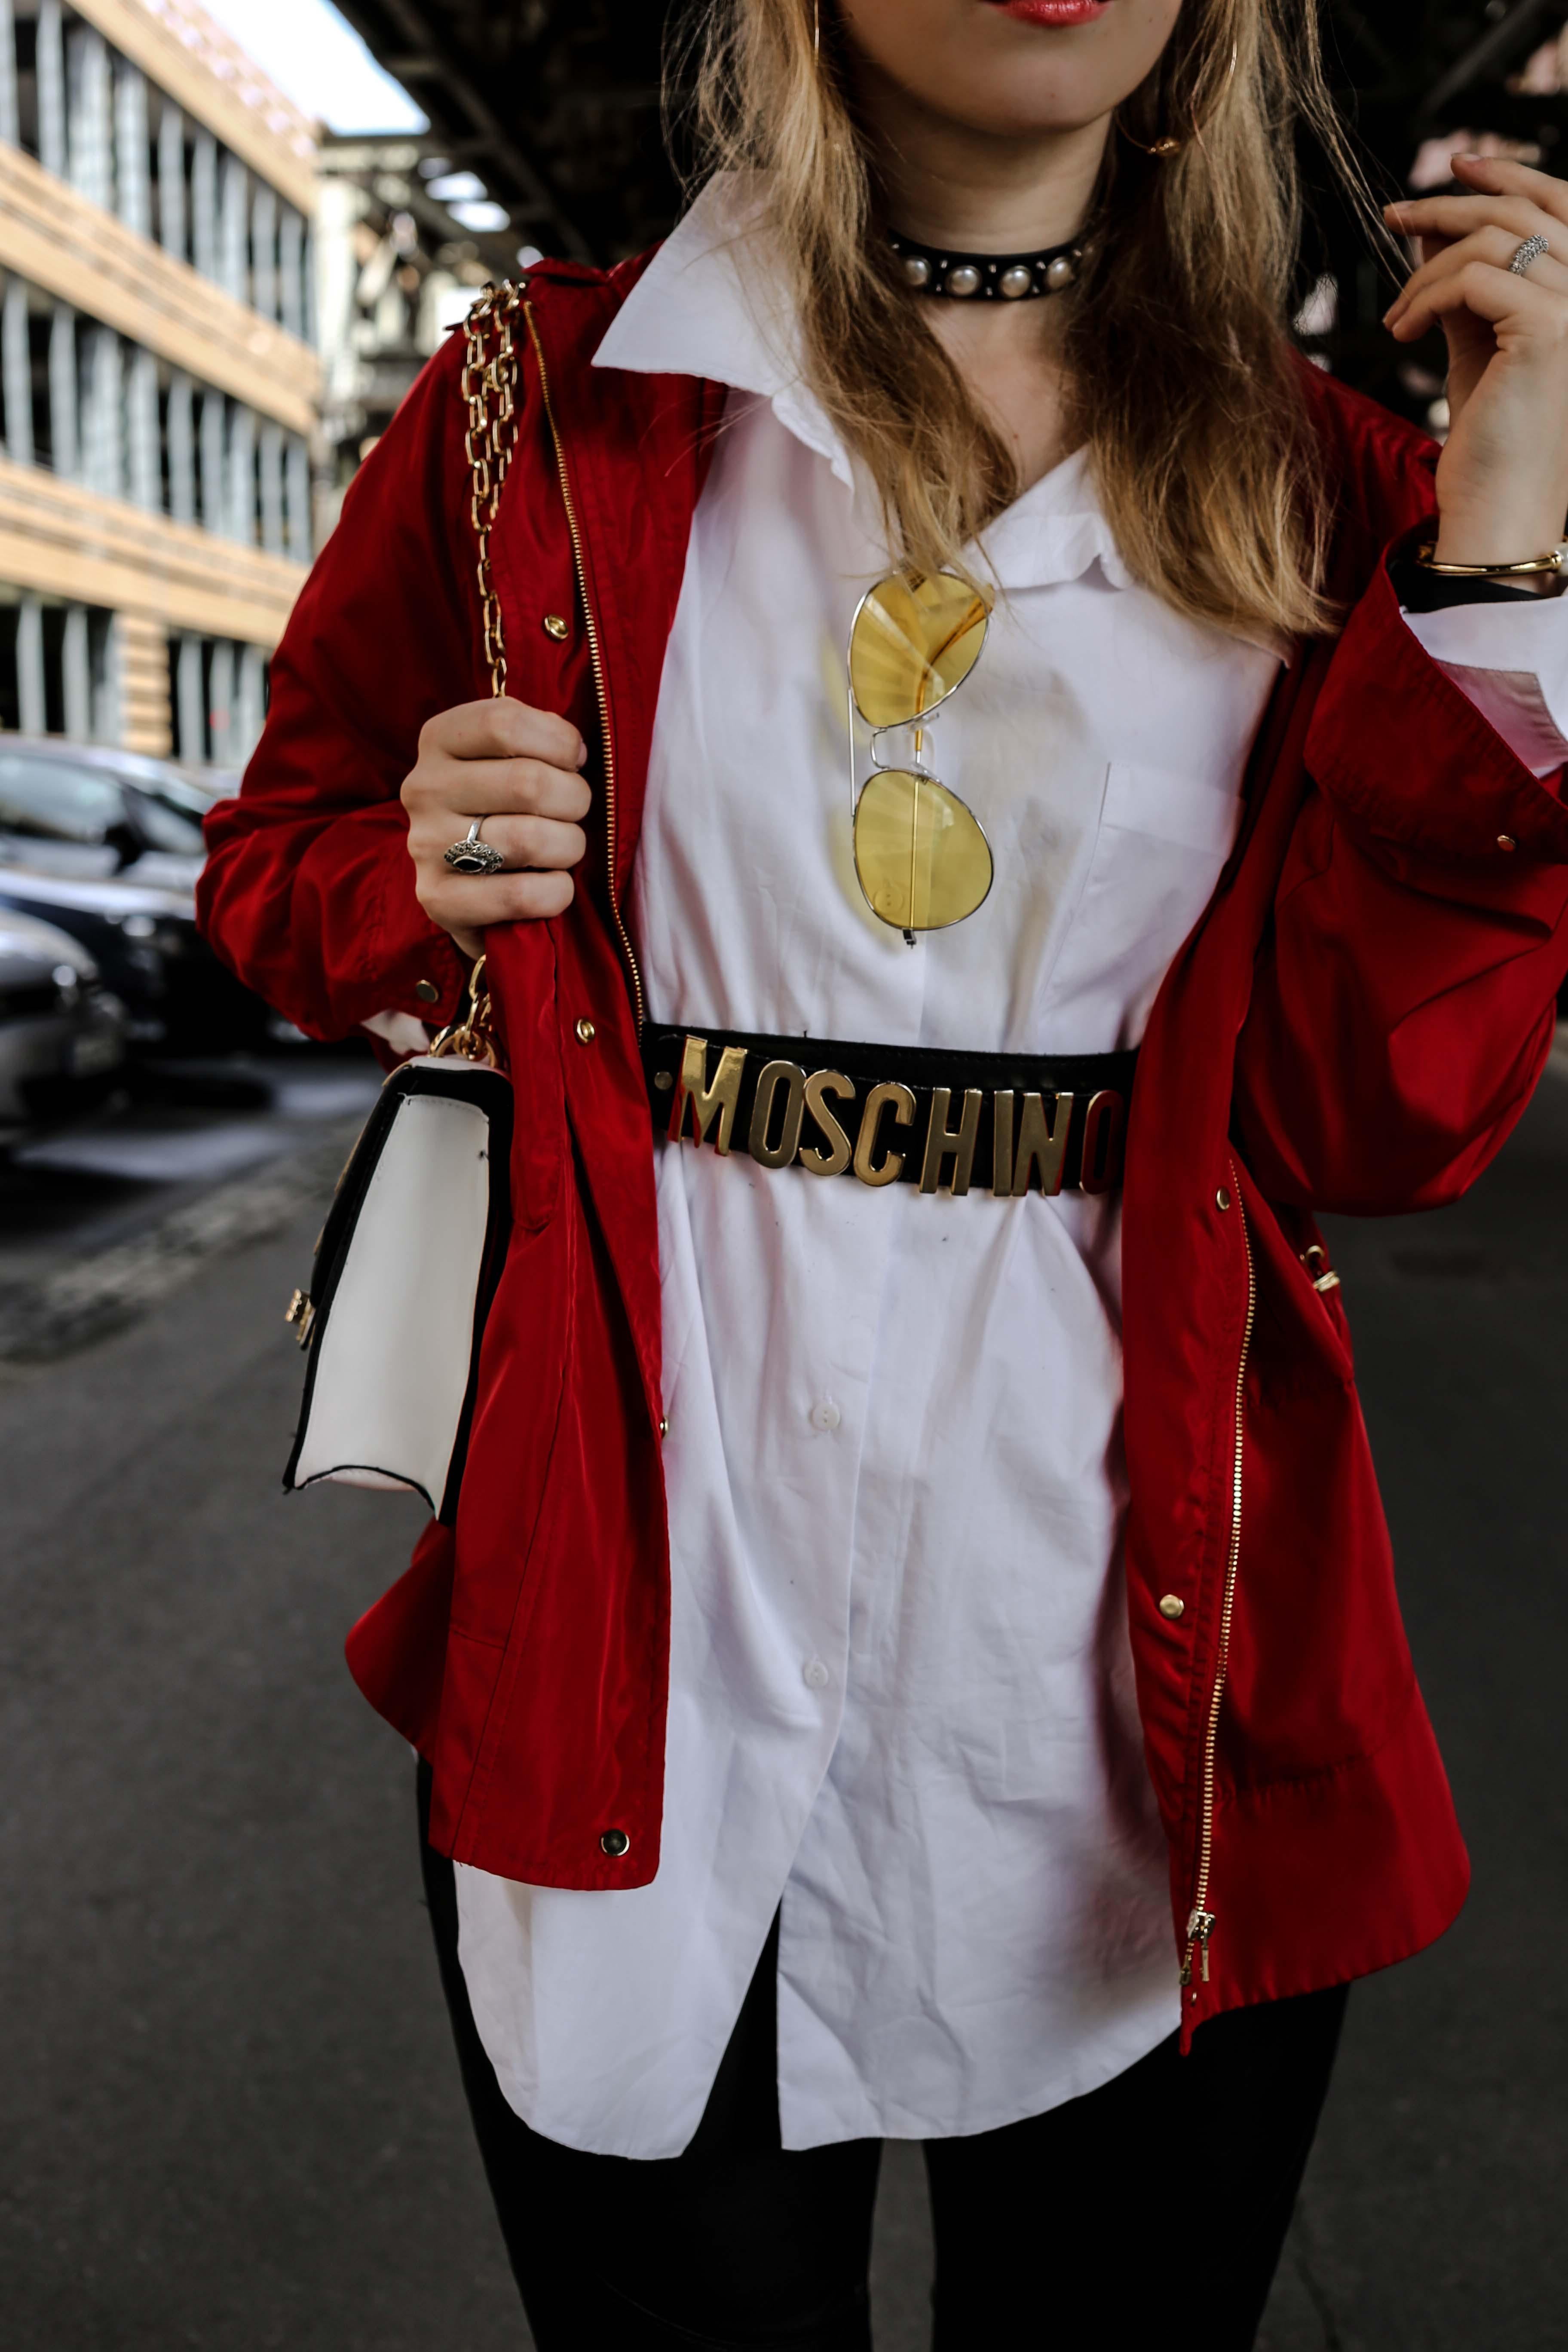 fashion-week-look-rote-regenjacke-grunge-outfit-berlin-modeblog-fashionblog_9342